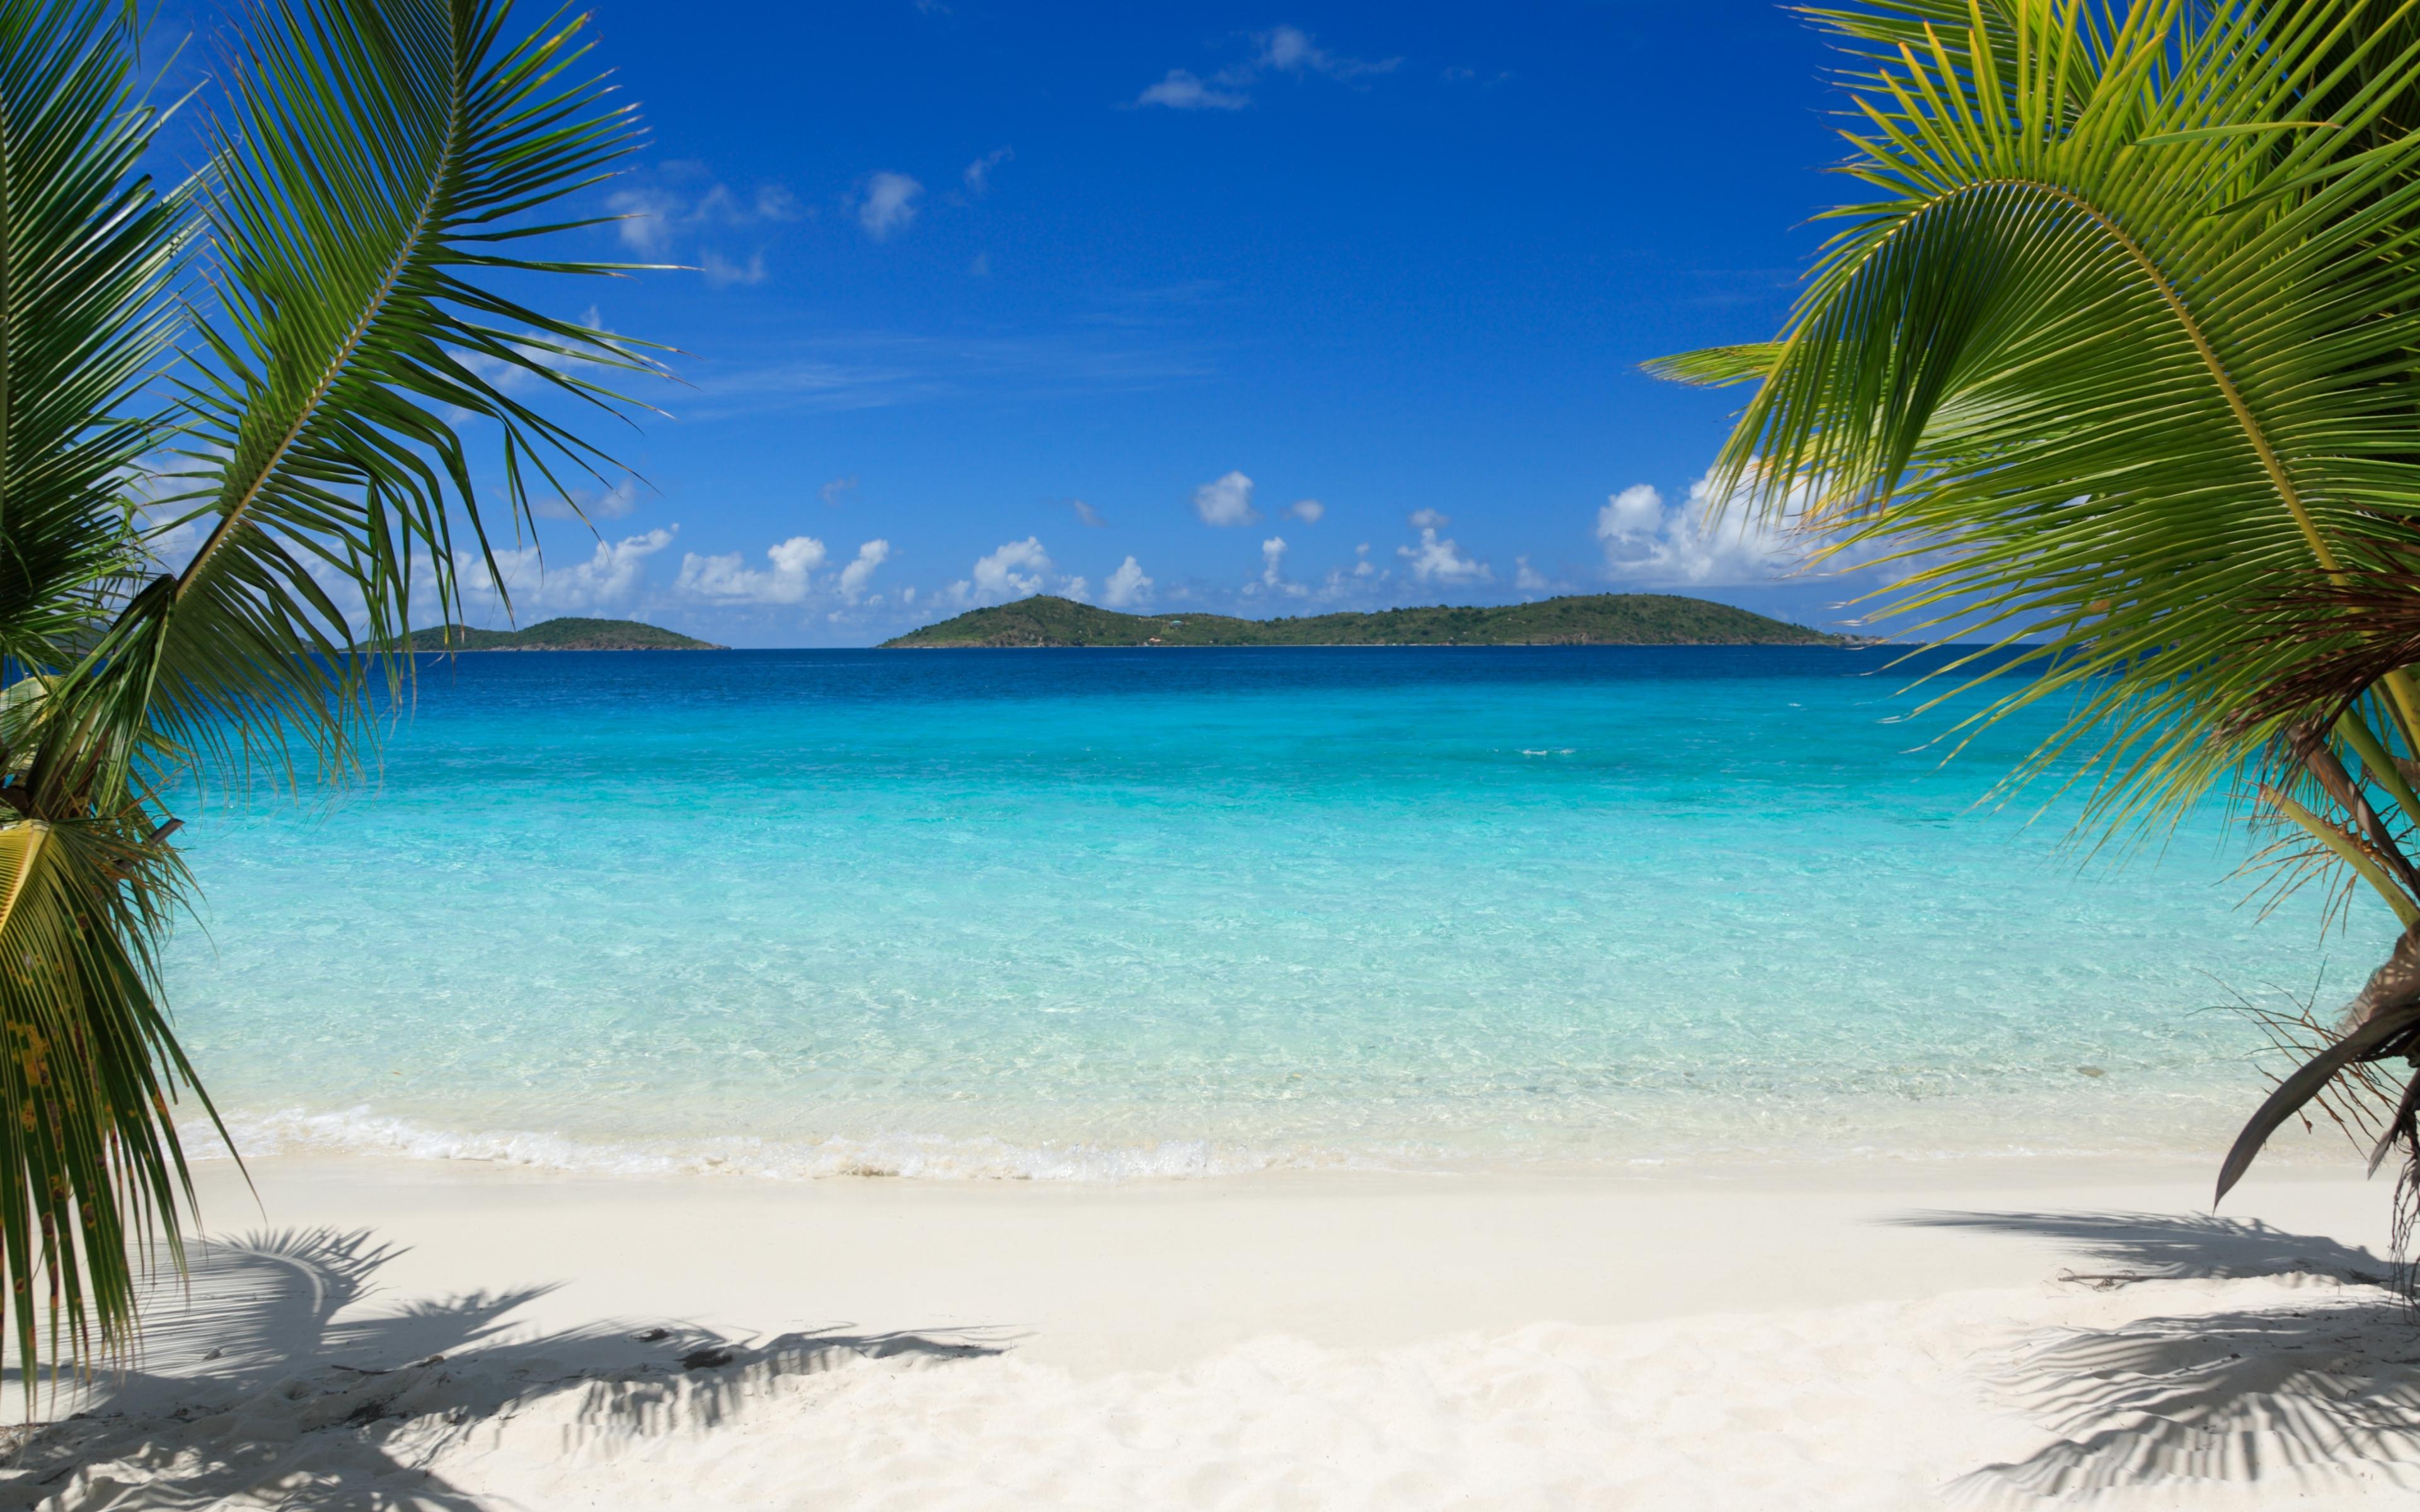 Tropical Island Beach Scenery: Tropical Island Beaches Desktop Wallpaper